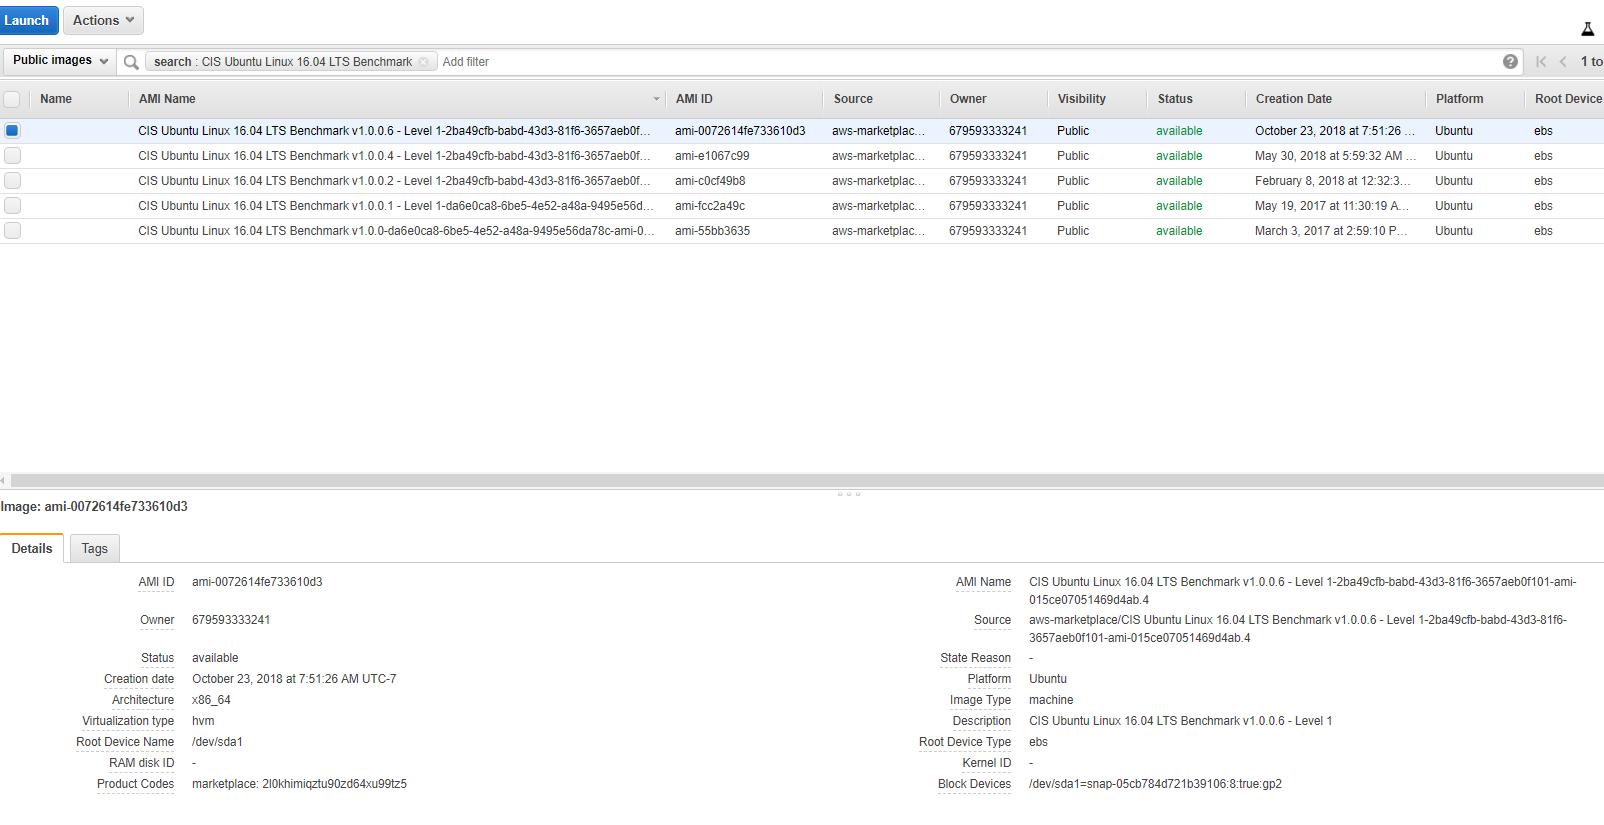 Additional documentation for data